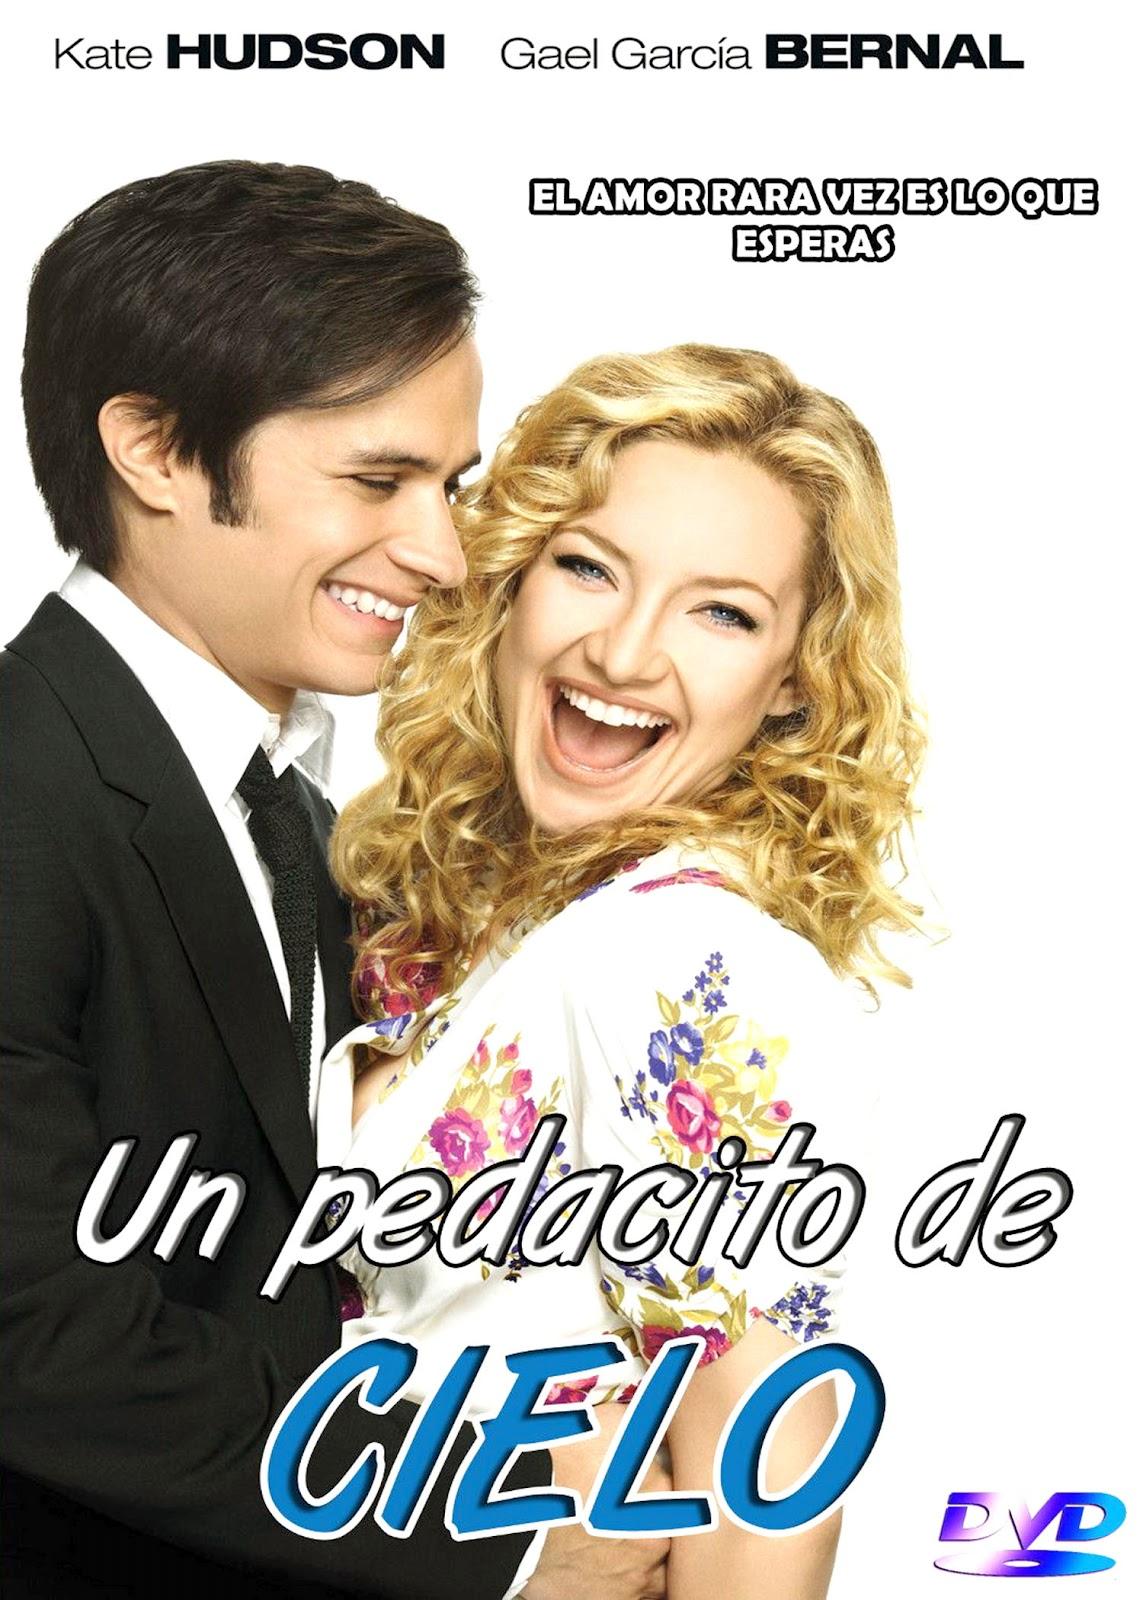 http://3.bp.blogspot.com/-SdzWvZldafc/UEv1B0fCmiI/AAAAAAAAJUI/QGbHyuvXPVo/s1600/Un+Pedacito+De+Cielo.jpg